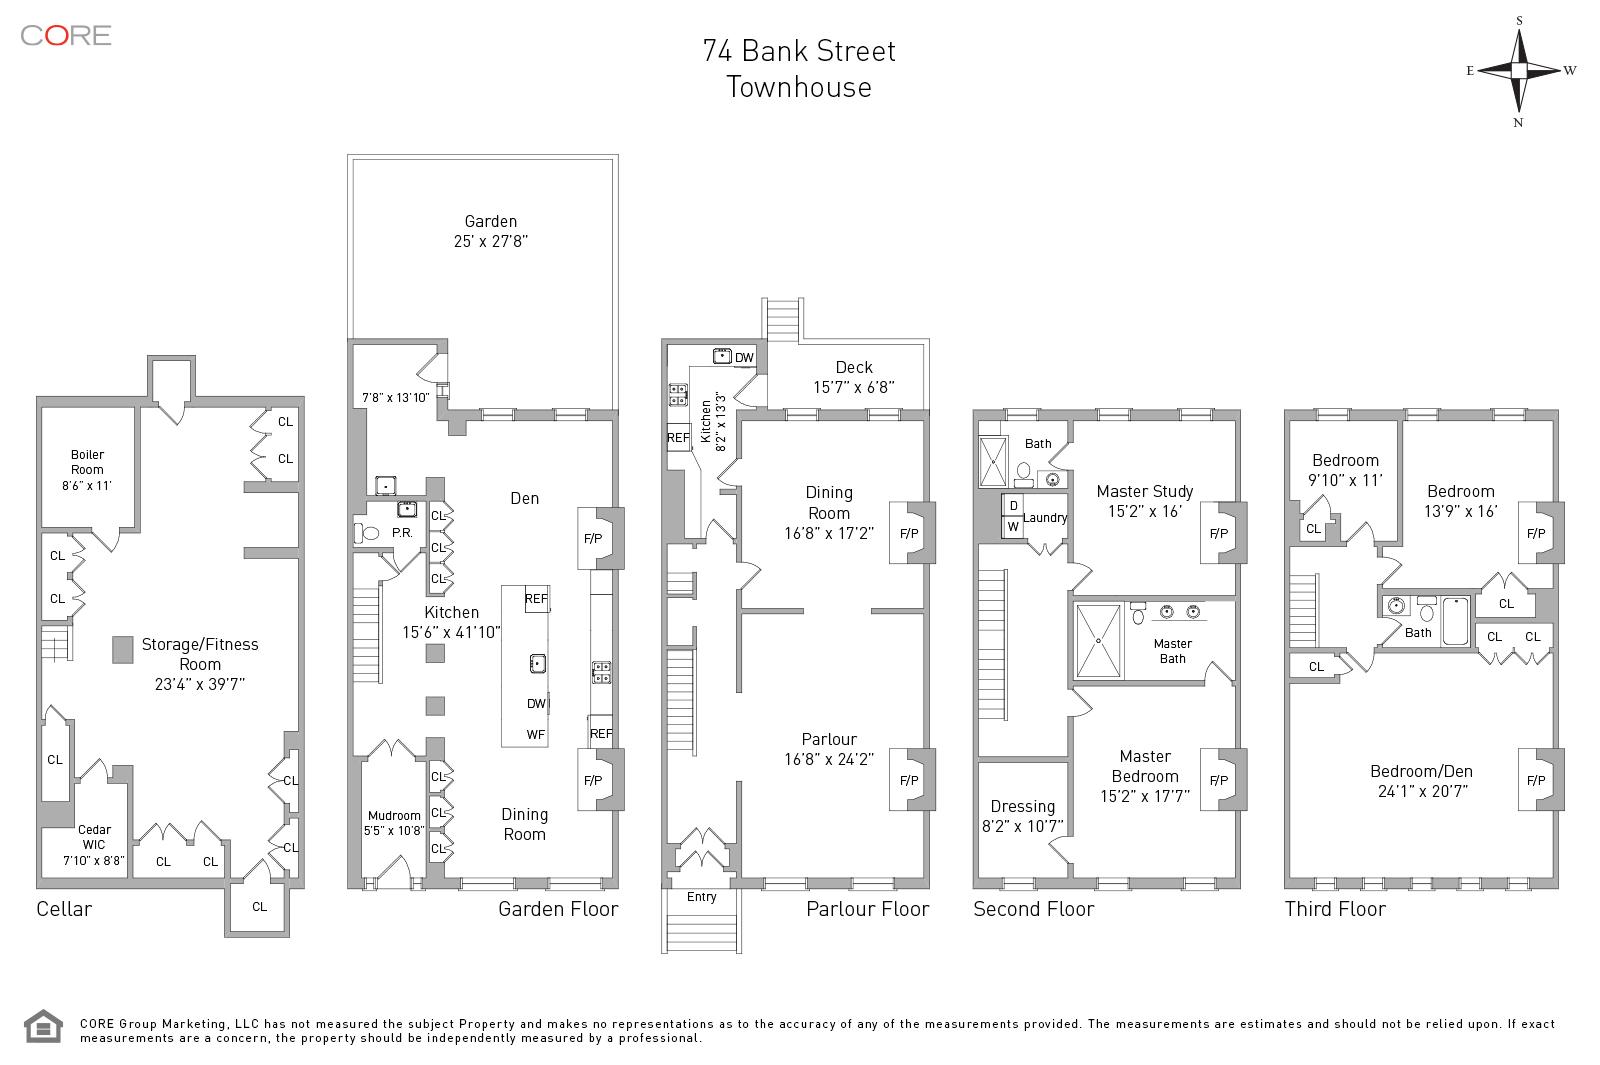 new york townhouse floor plans.  74 Bank St New York NY 10014